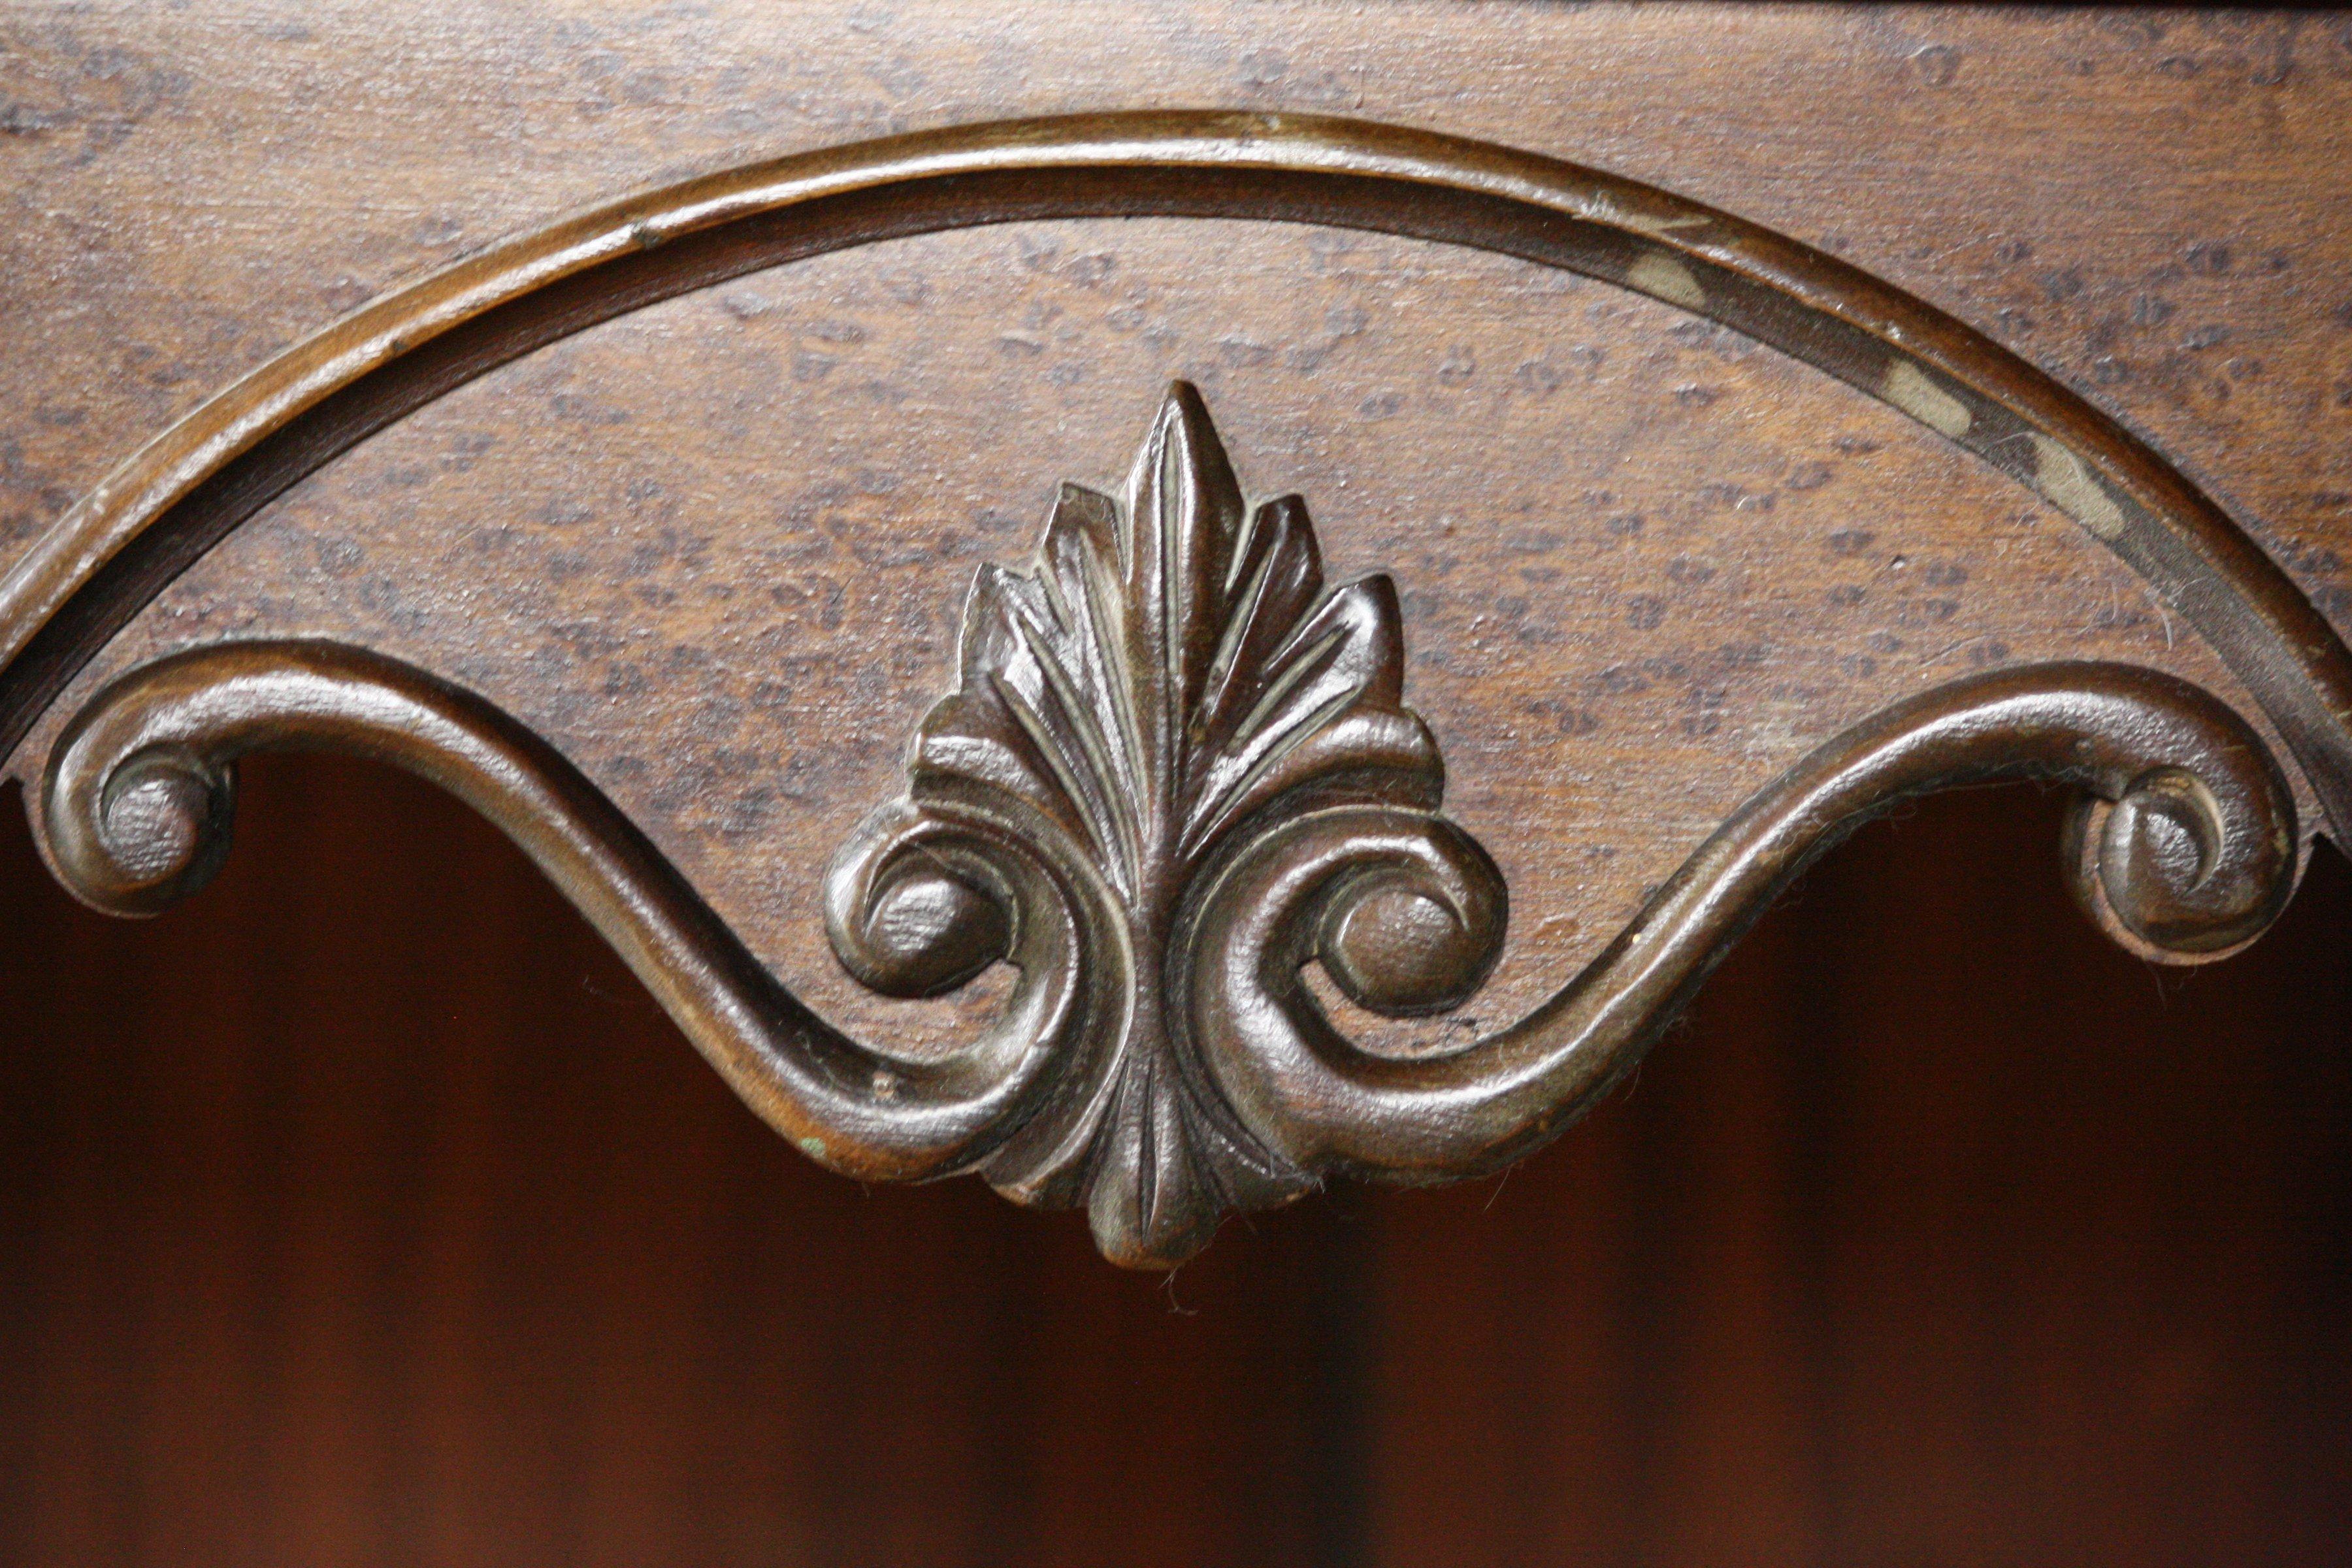 Wood carving designs furniture - Leaf Scroll Carved Wooden Decoration On Antique Radio Cabinet